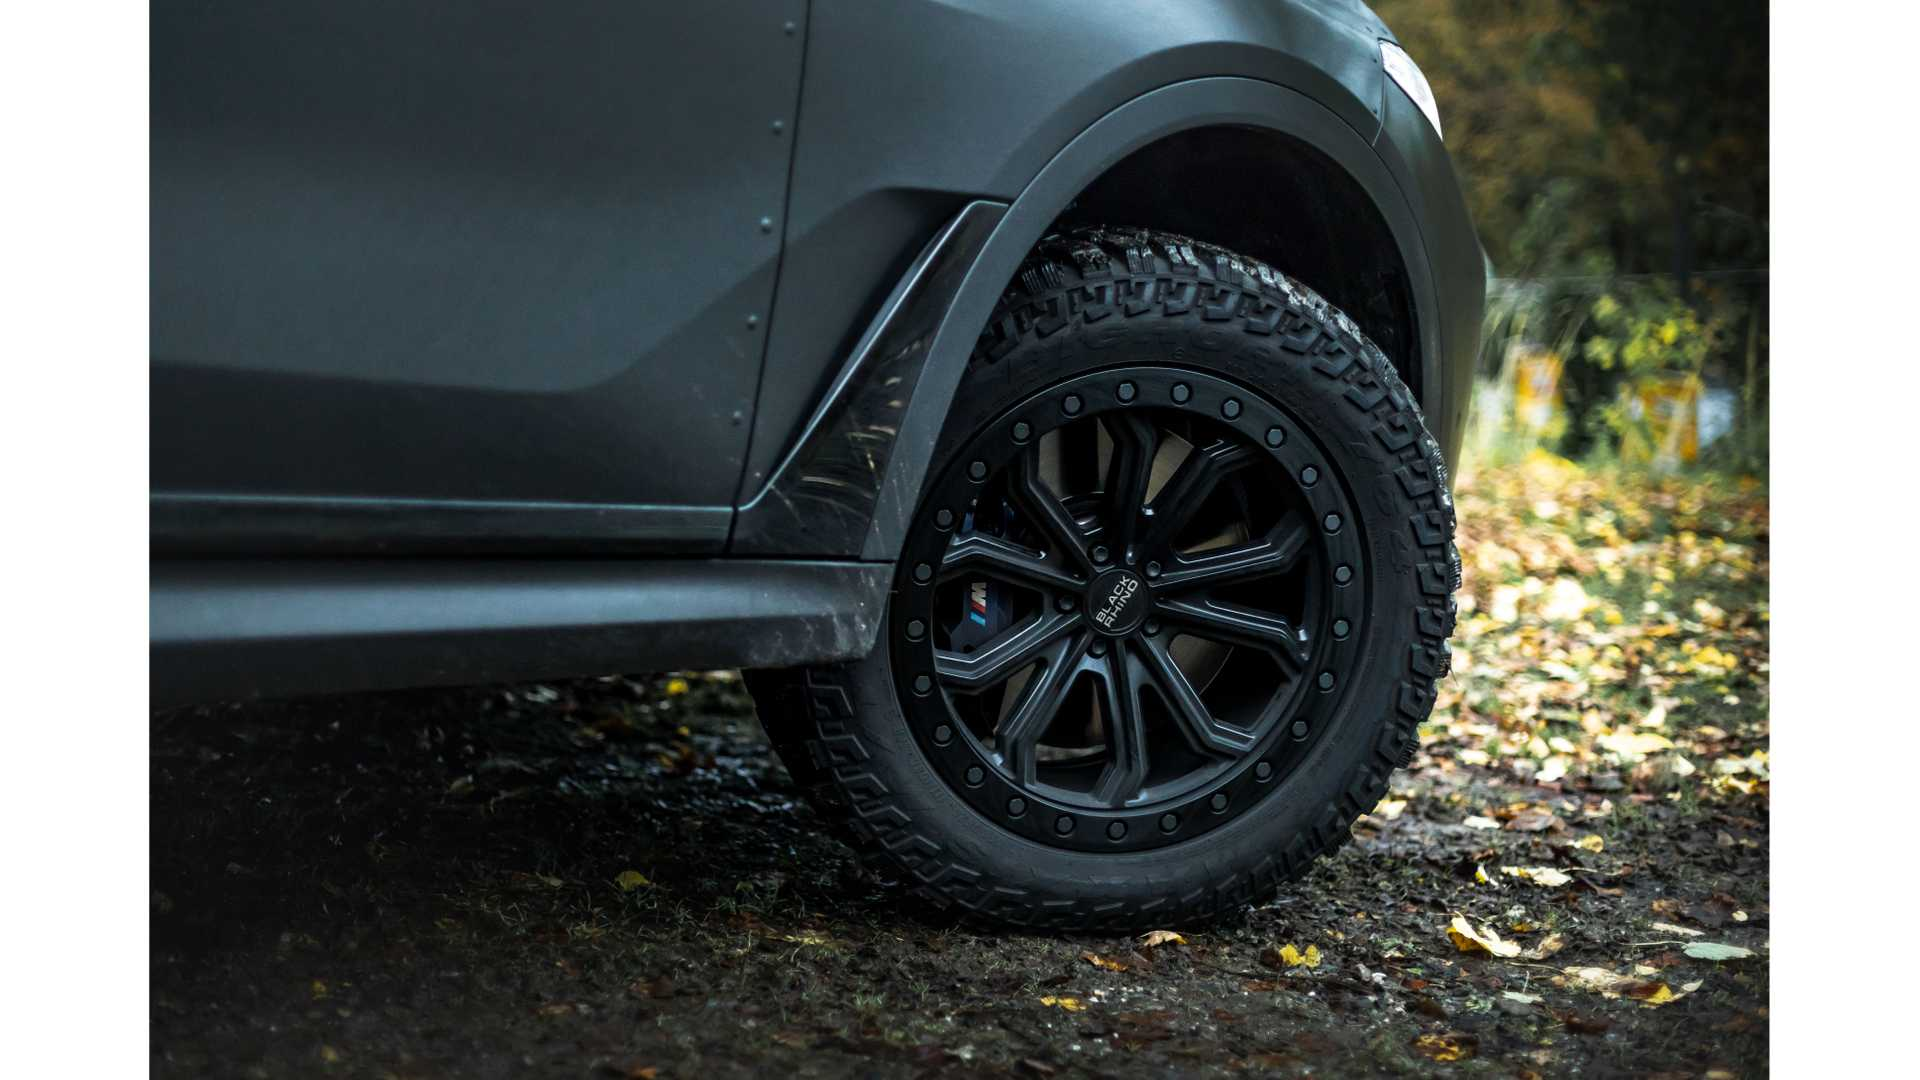 BMW-X7-Dirt-Edition-By-Manhart-10